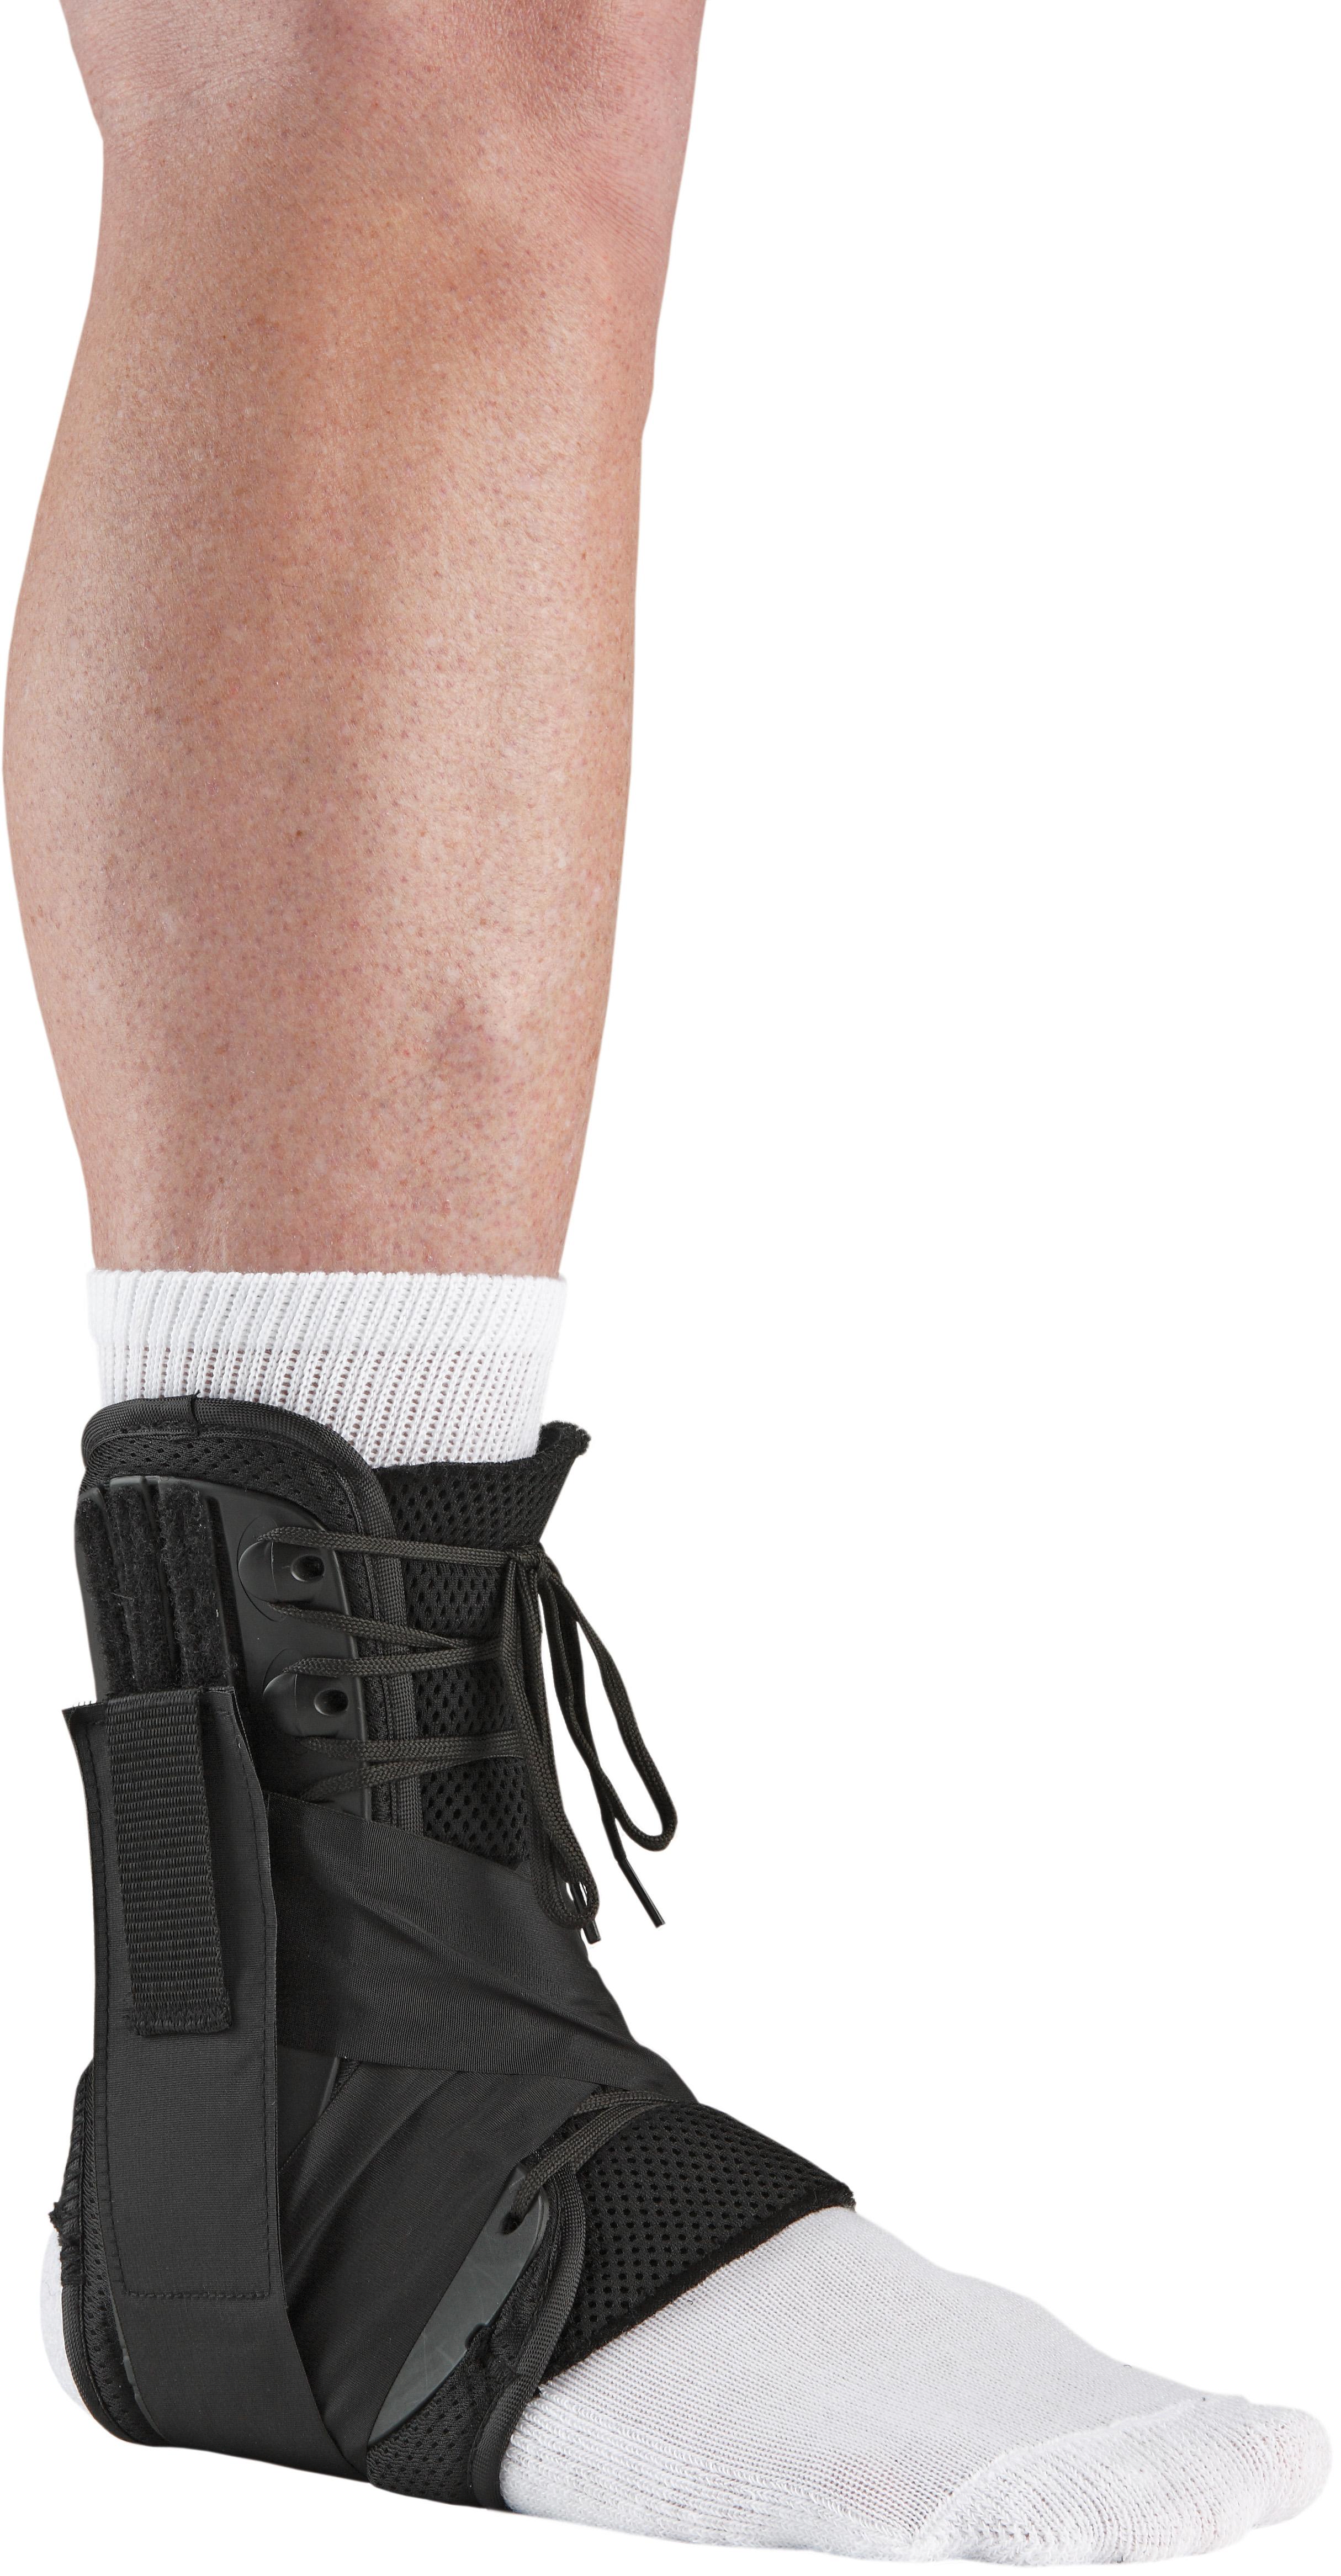 exoform-ankle-brace-xsmall-20602-ossur-os378479-2.jpg